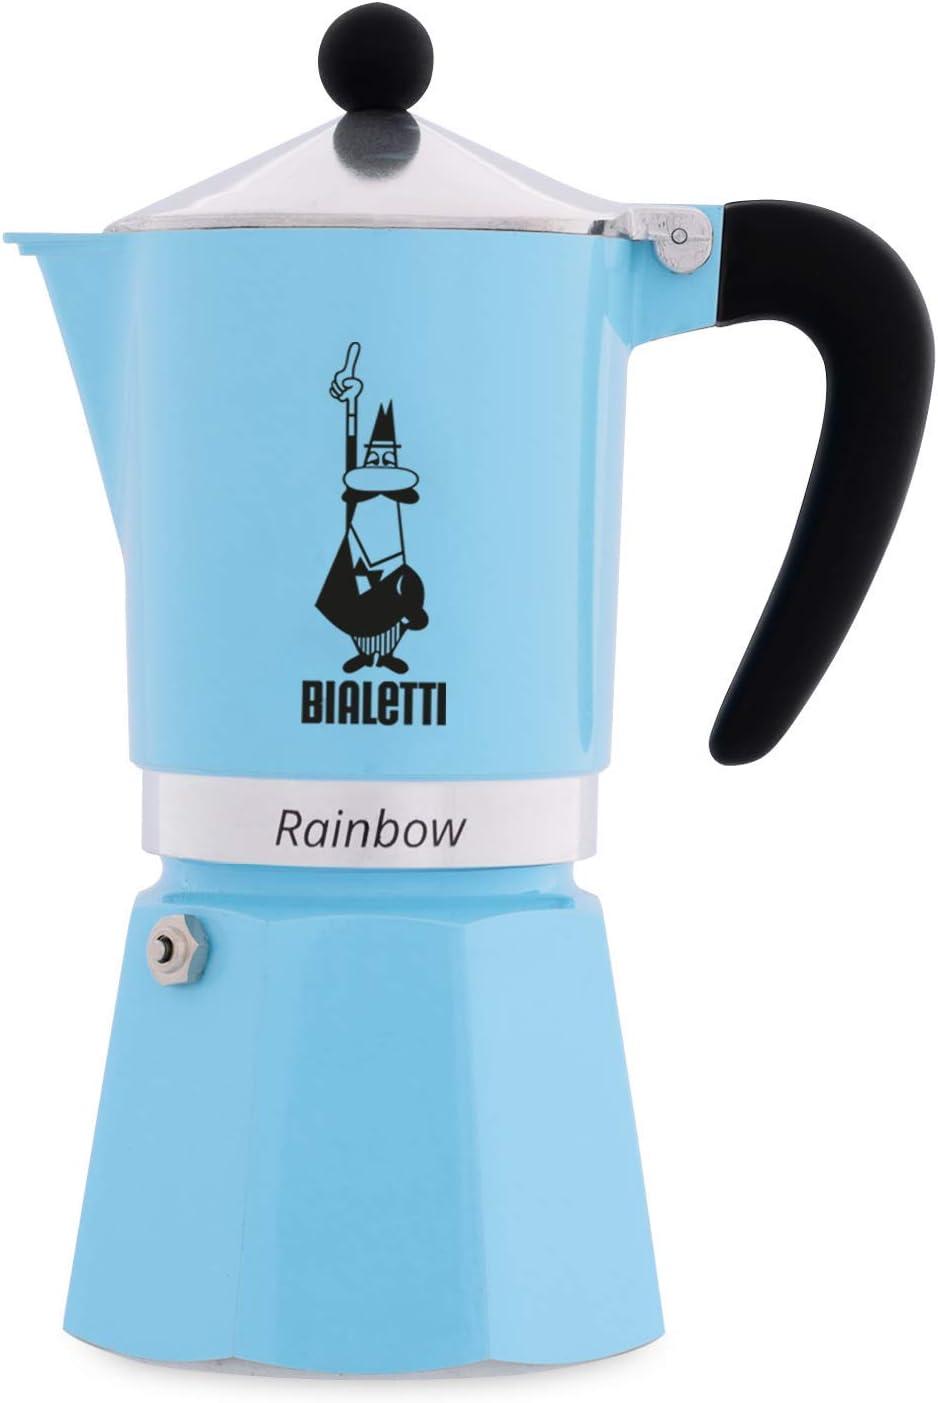 Bialetti Rainbow Cafetera Italiana Espresso,6 Tazas, Aluminio, Azul: Amazon.es: Hogar